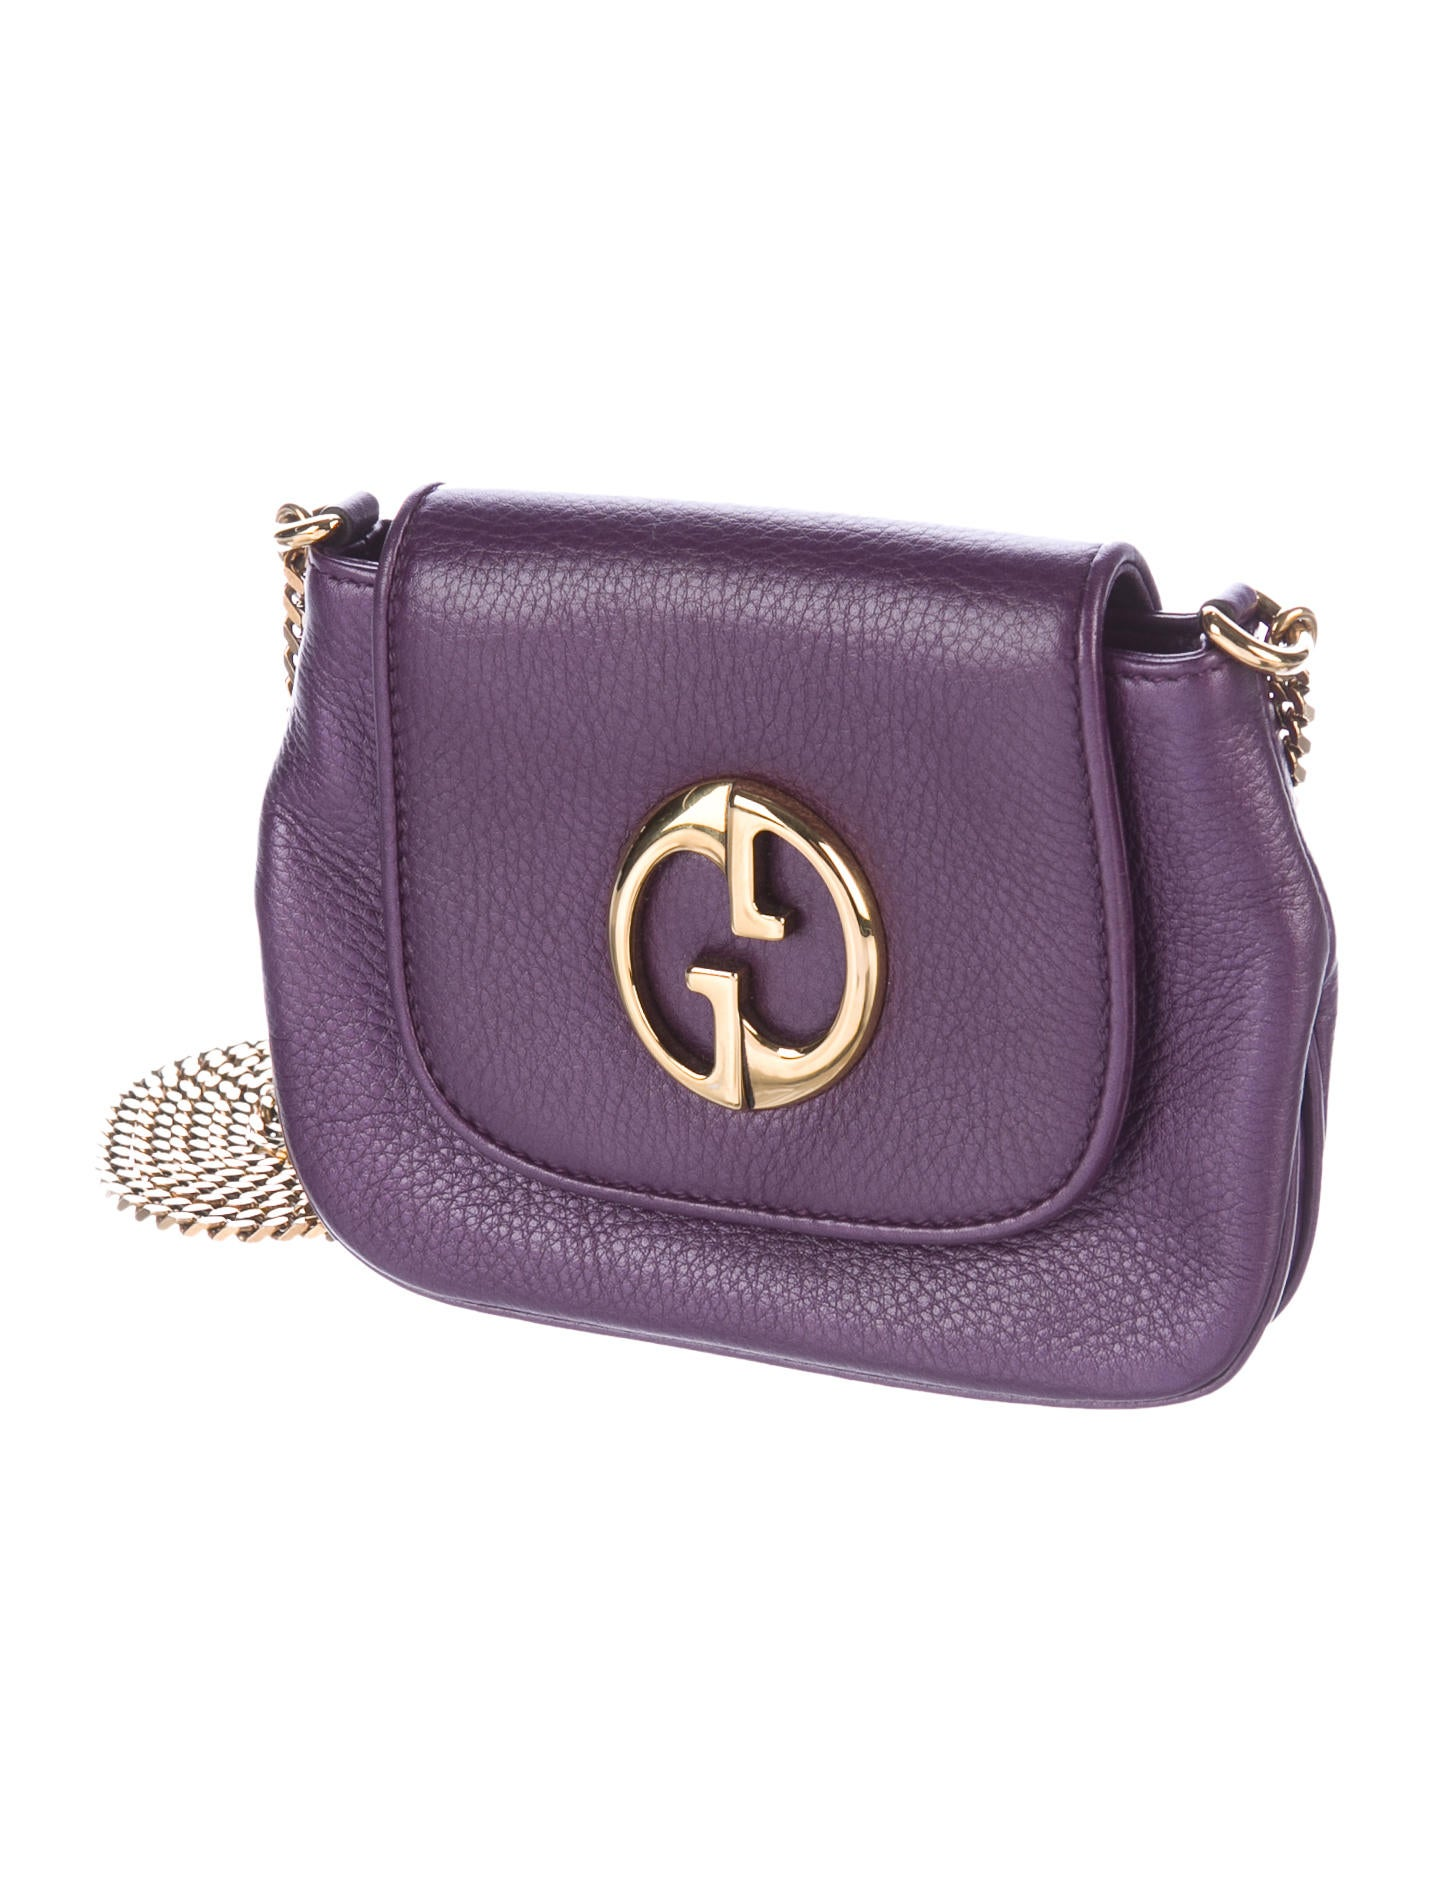 Gucci 1973 Small Crossbody Bag Handbags Guc171515